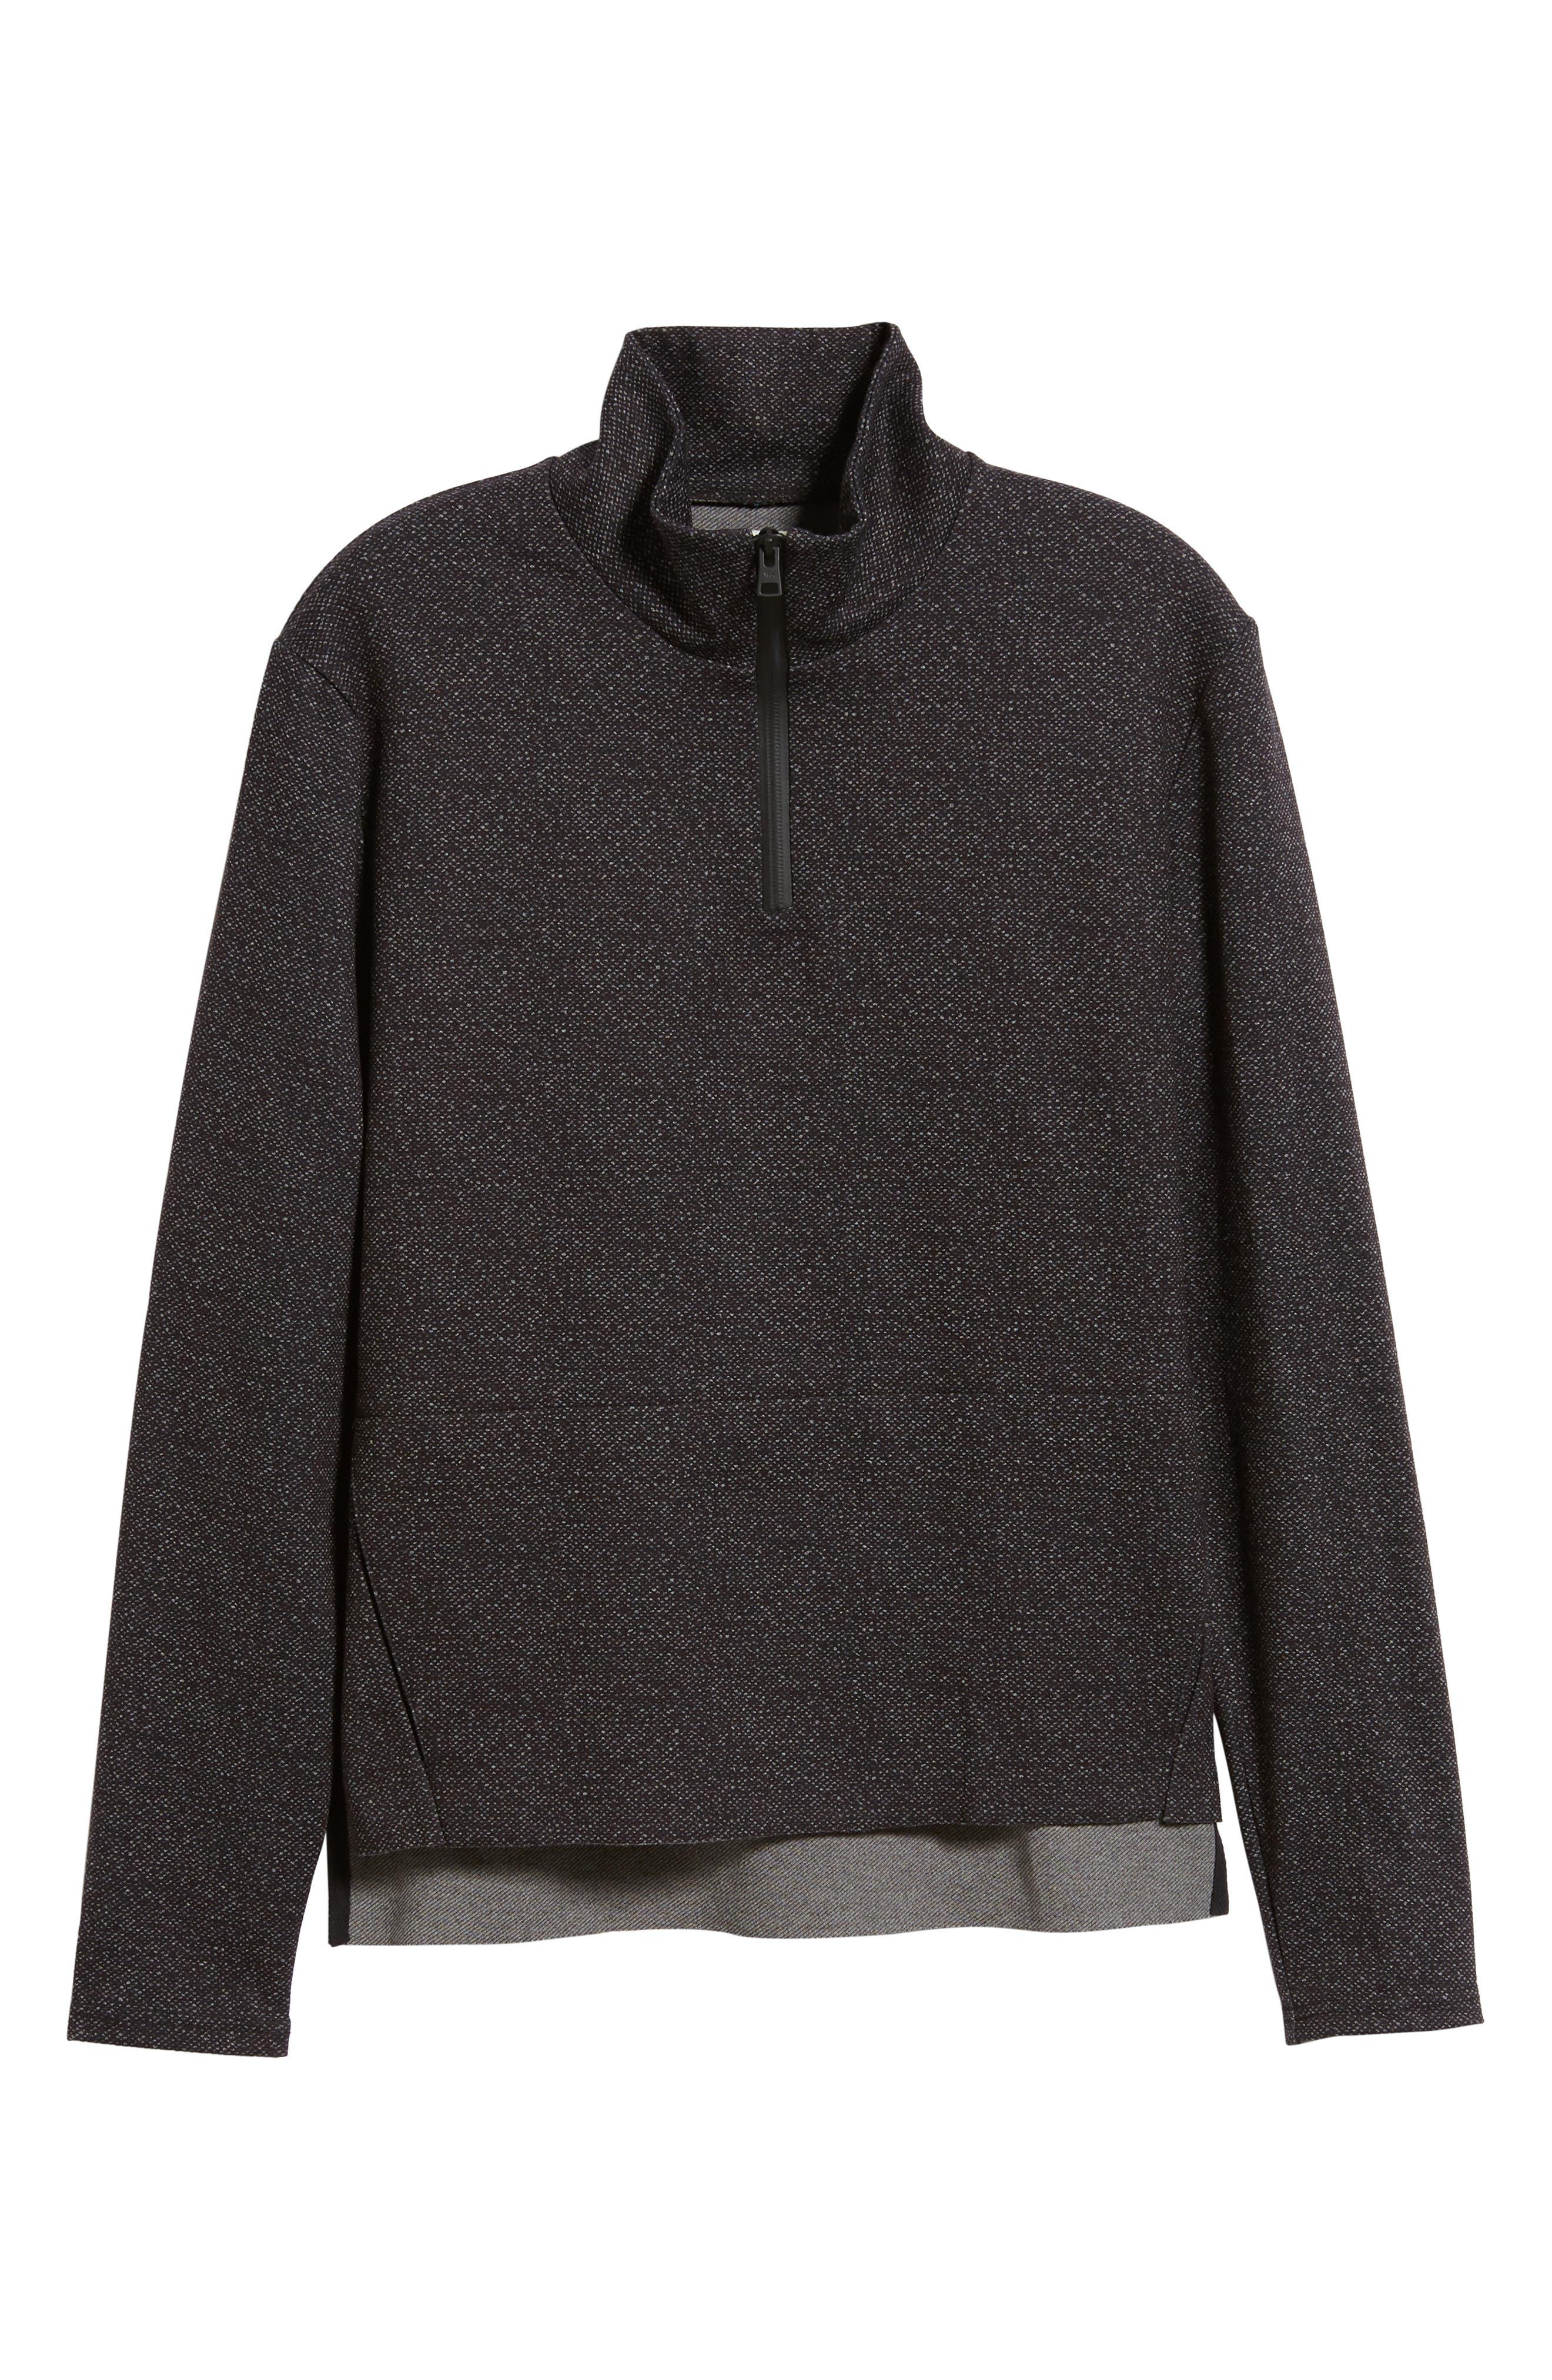 Oscar Quarter Zip Slim Fit Sweater,                             Alternate thumbnail 6, color,                             CHARCOAL